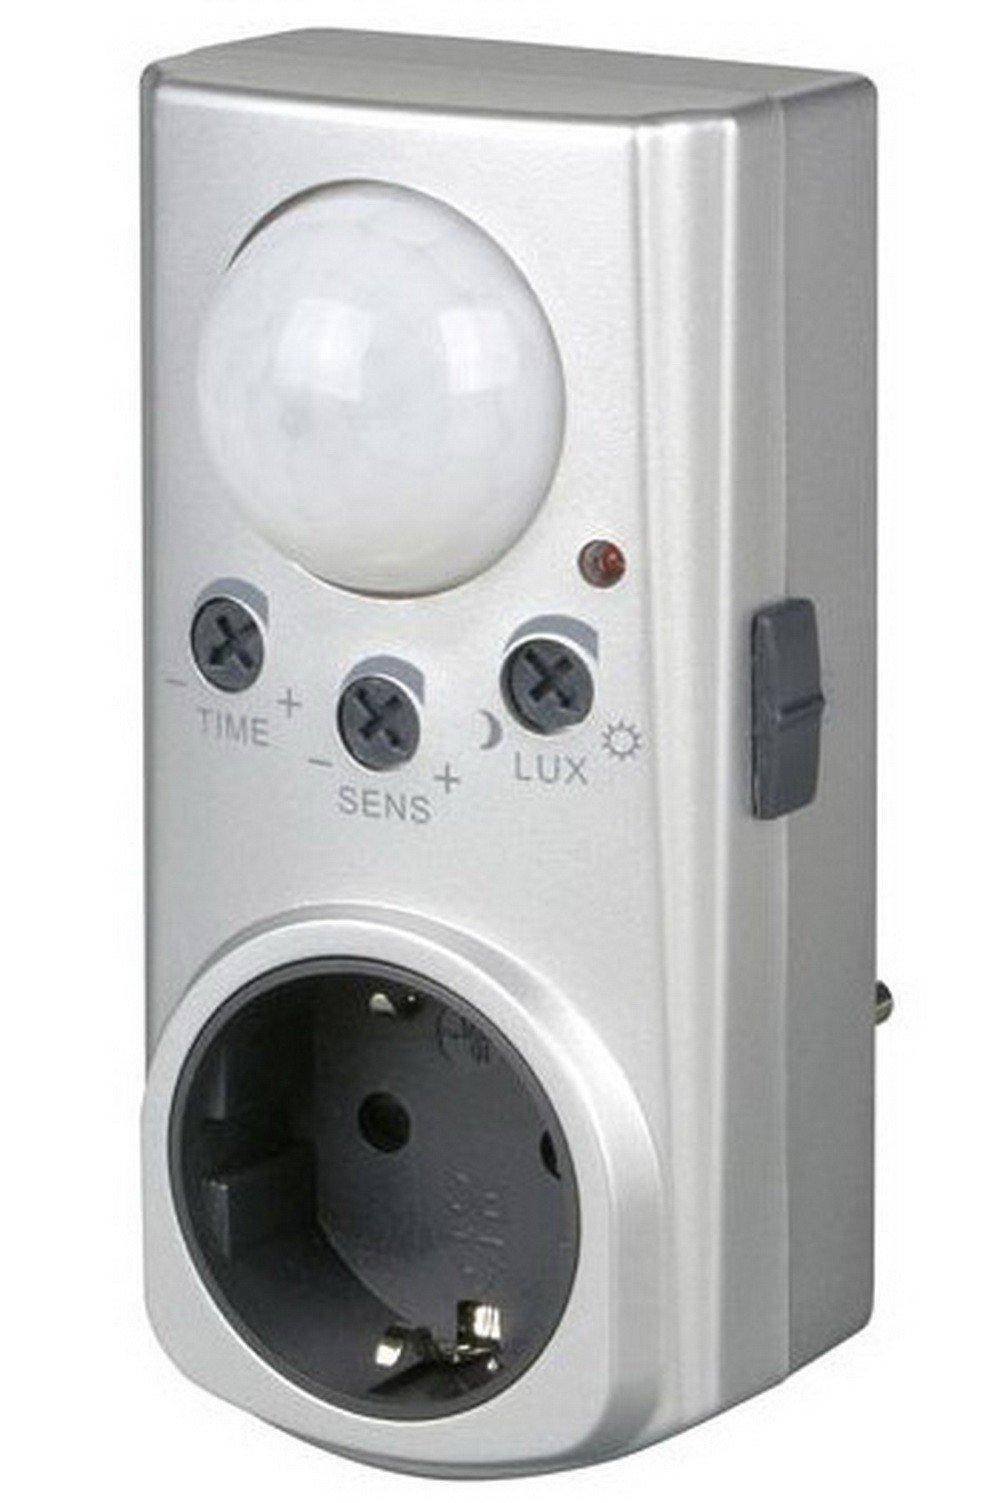 Chilitec 19603 Temporizador, 240 V product image